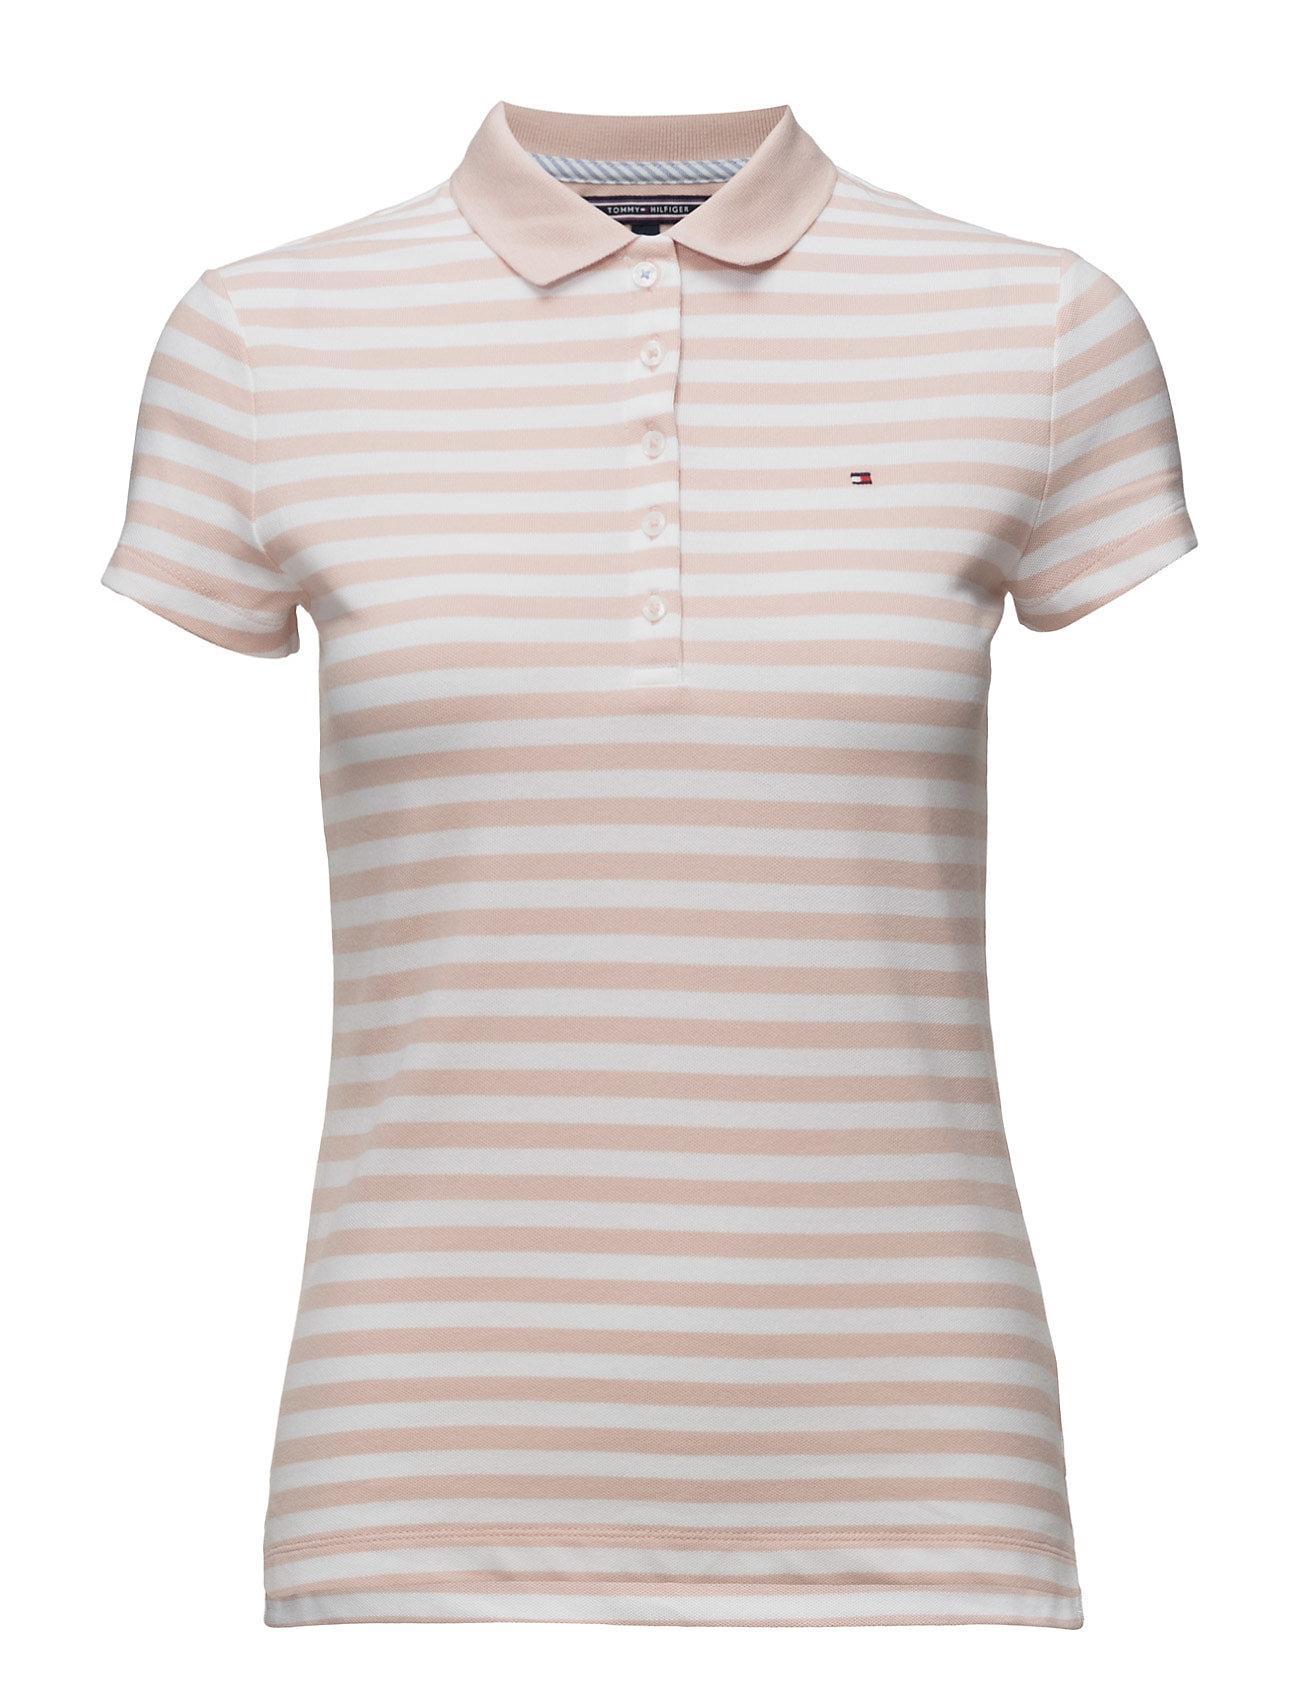 New Chiara Str Pq Polo Ss Tommy Hilfiger T-shirts & toppe til Kvinder i